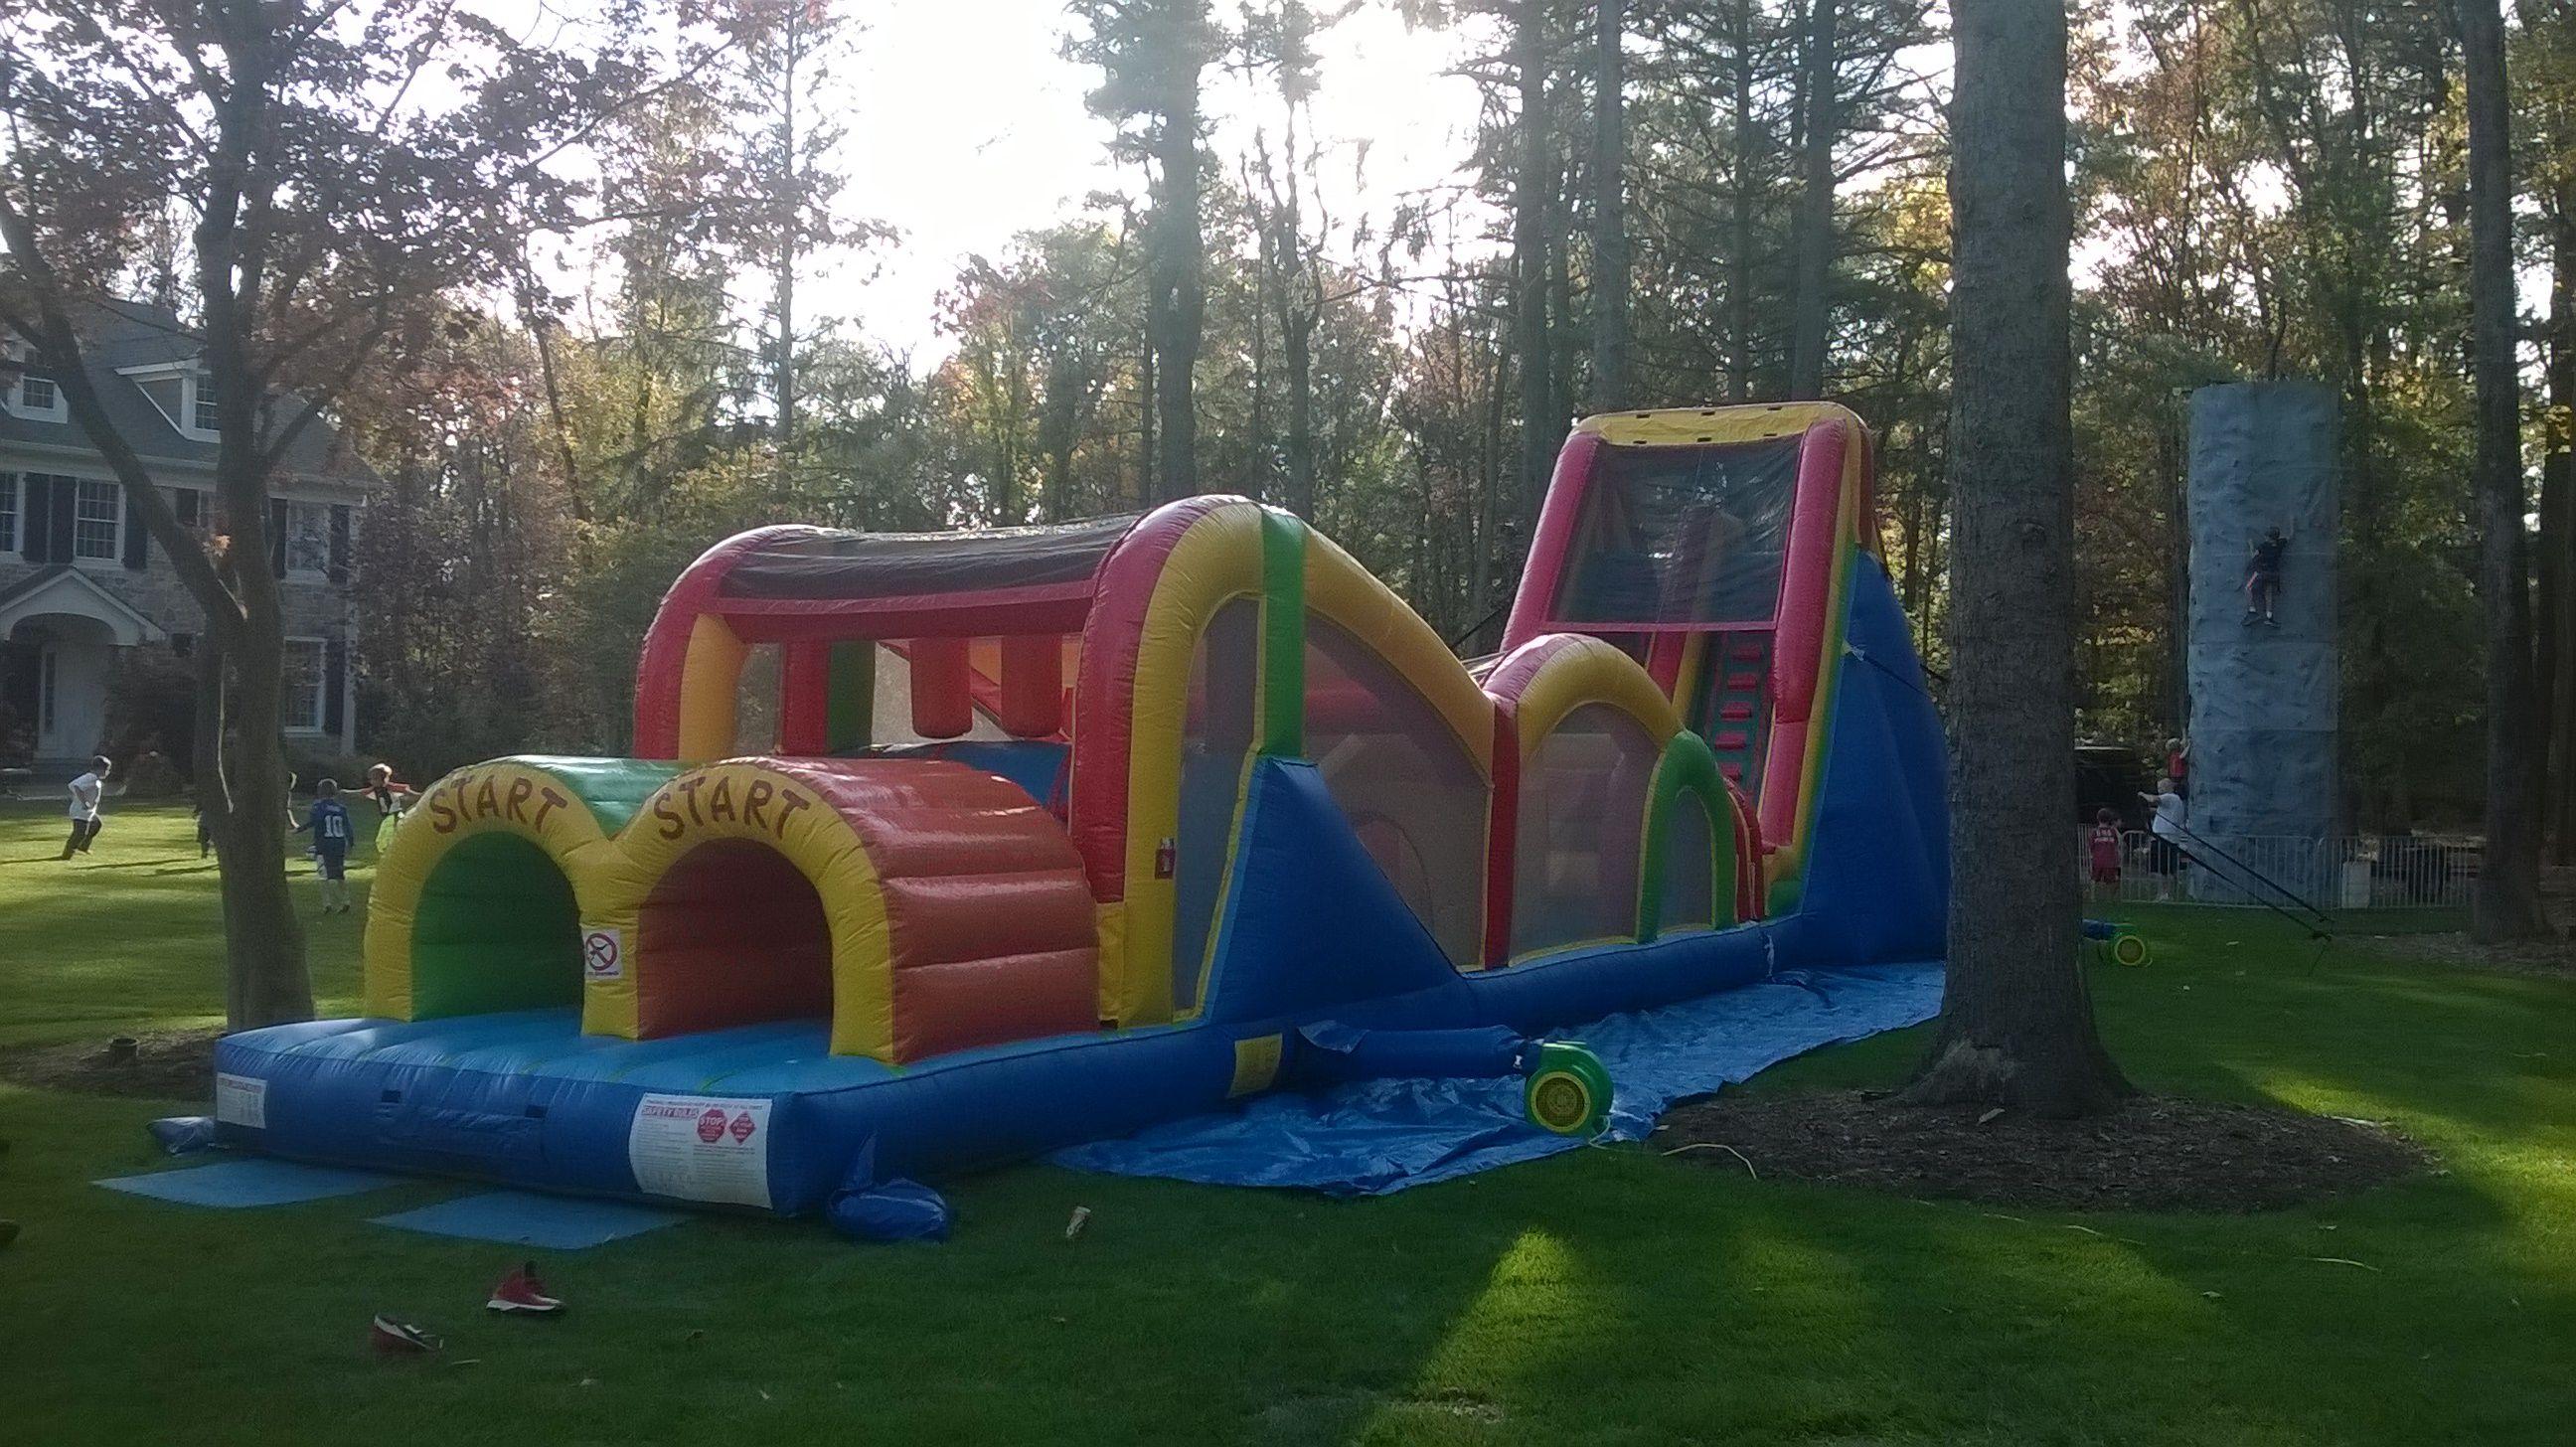 Inflatables R Fun Delaware